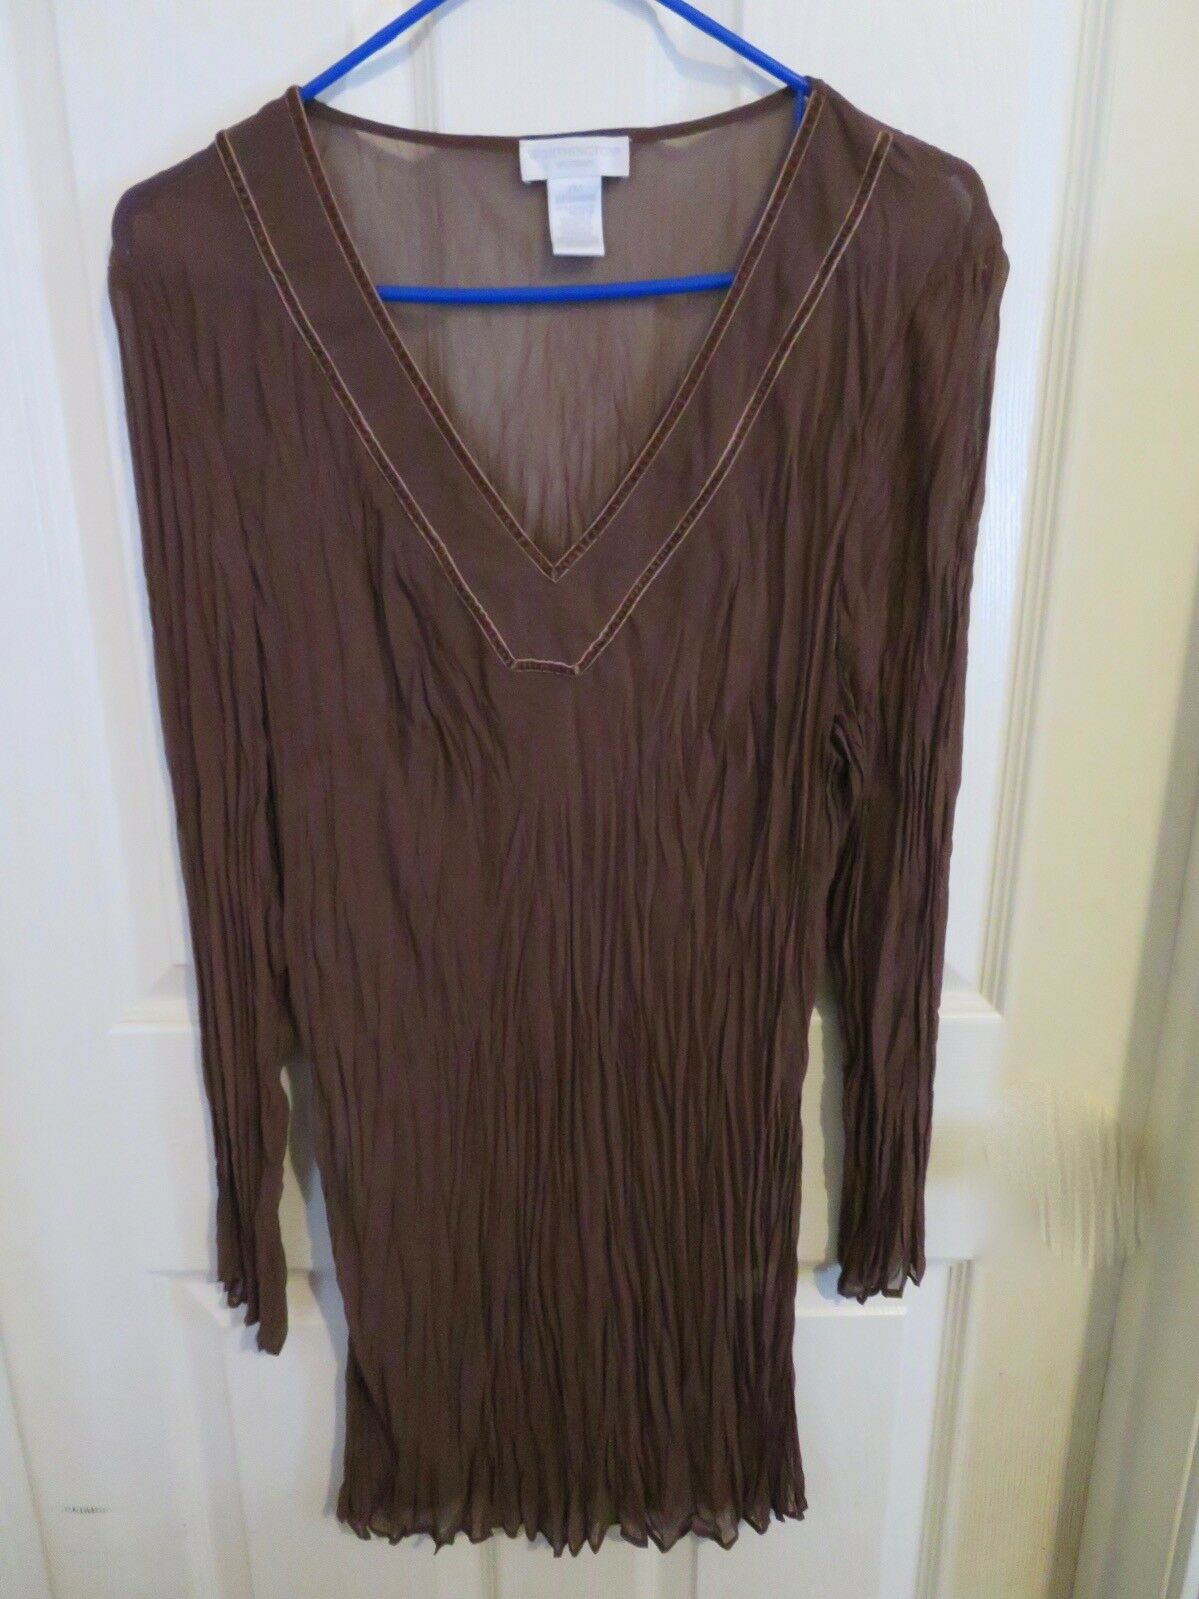 7073c753e37 Women s Worthington Sheer Brown Long Blouse Shirt Plus Size 2X Crinkle  Sleeve nrisow31530-Tops   Shirts